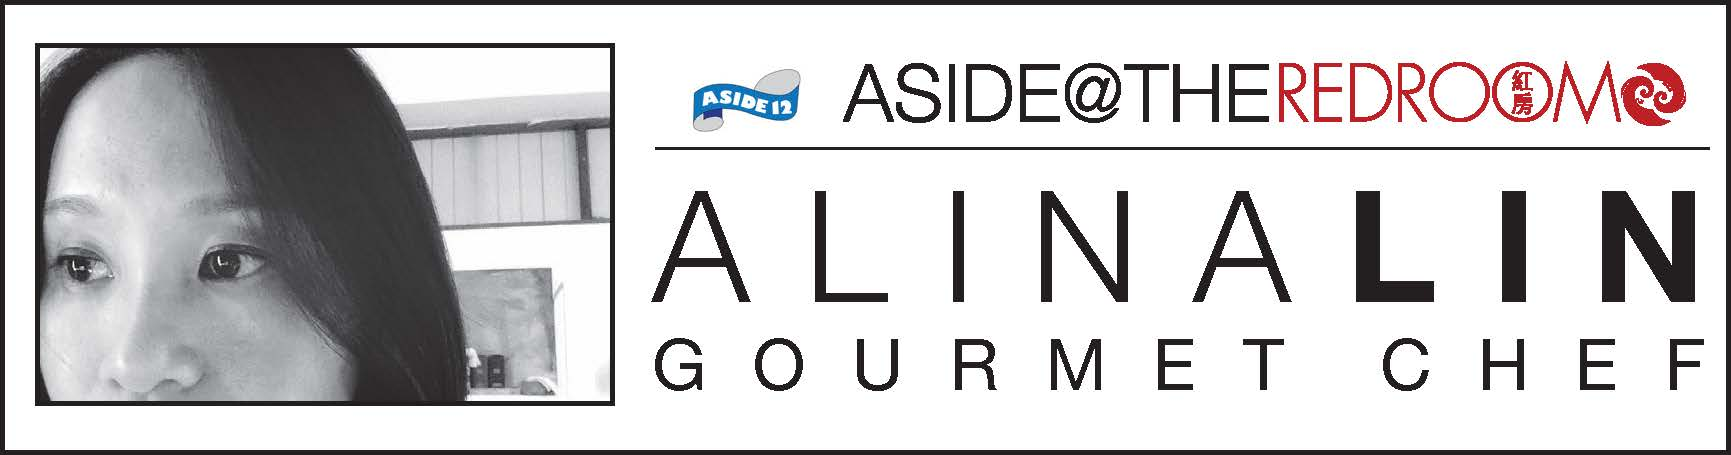 ASIDE 12 PRESENTERS alina